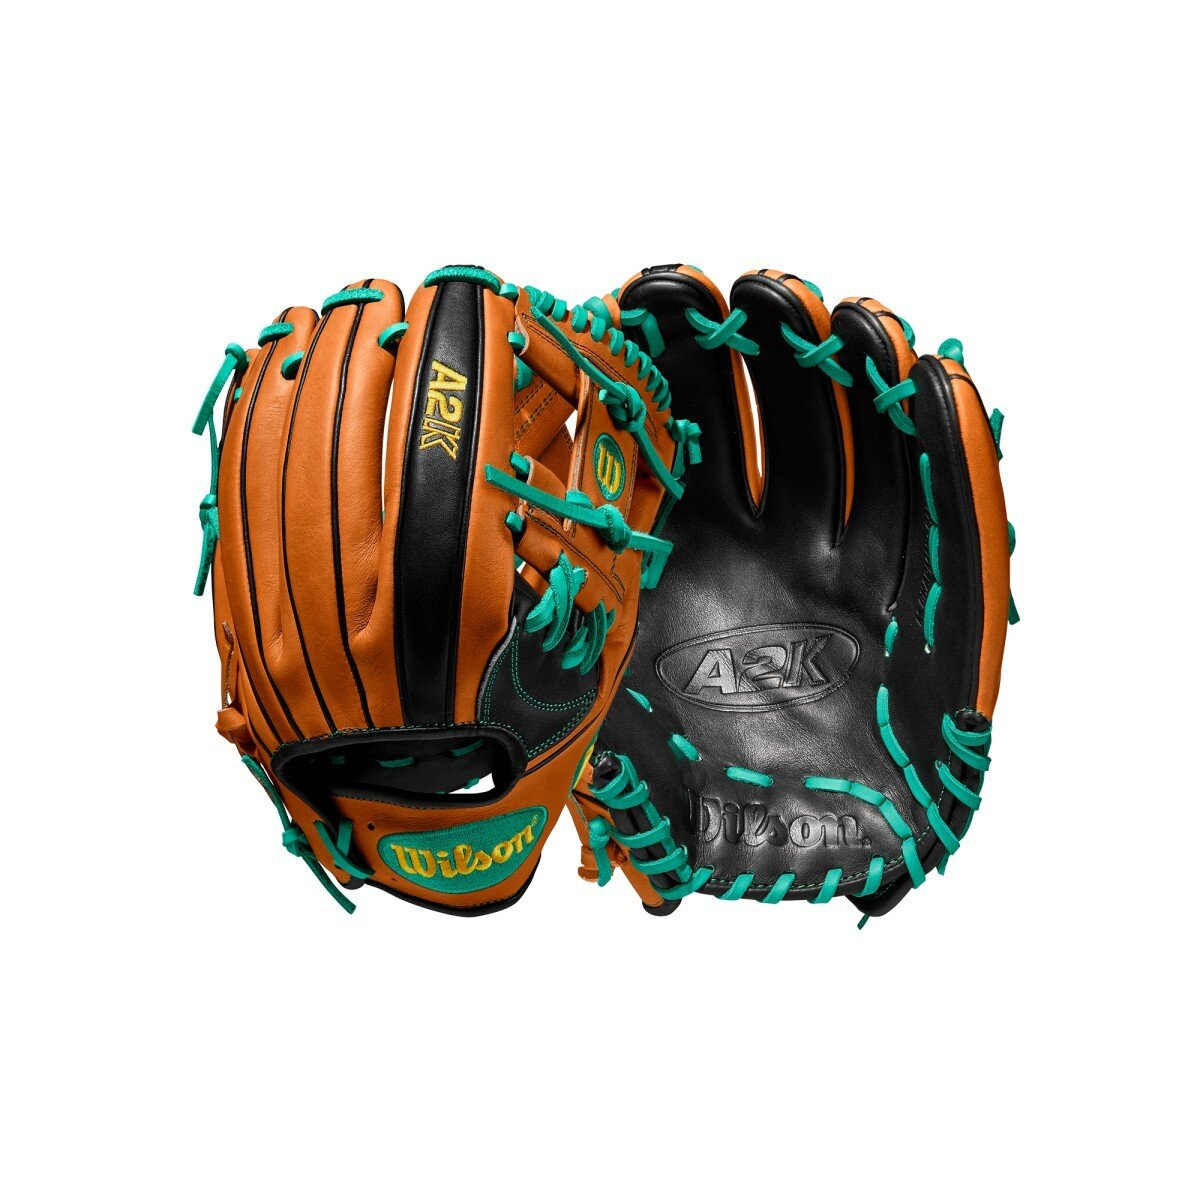 On-Deck-Batting-Cages-Wilson-DeMarini-Discount-Catching-Gloves.jpg